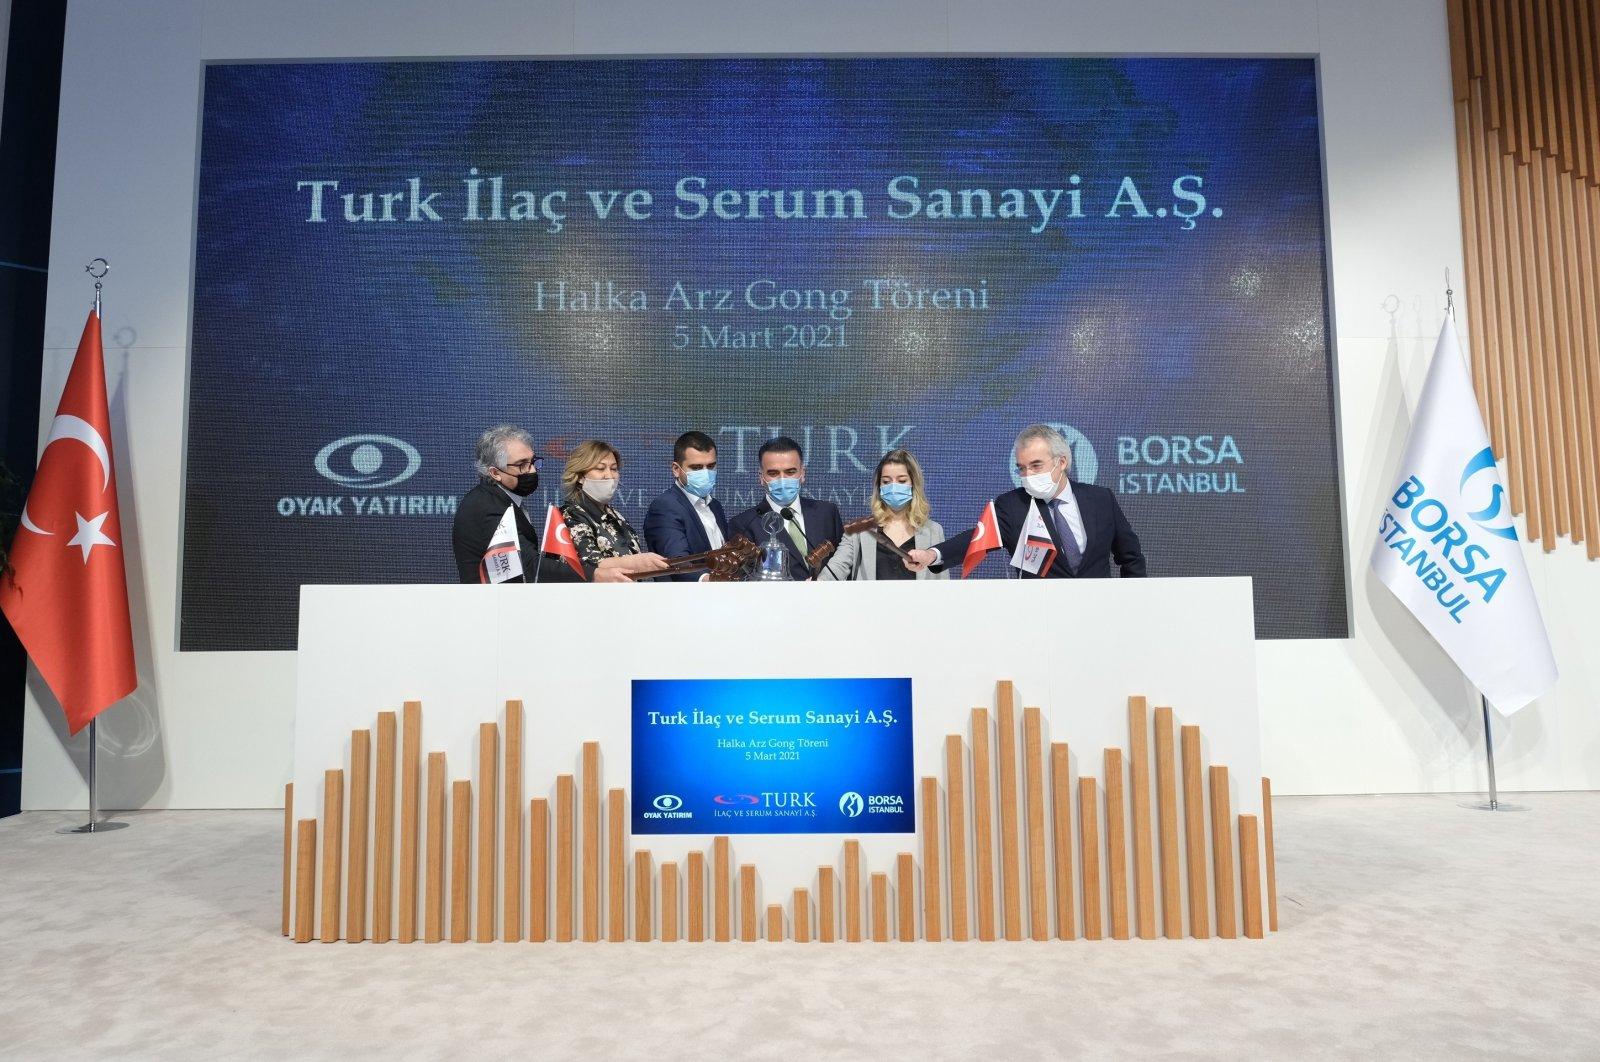 Oyak Yatırım and TURK Drug and Serum Industries officials kick off the gong ceremony of the initial public offering in Ankara, Turkey, on Mar. 5, 2021 (Photo courtesy of Oyak Yatırım)